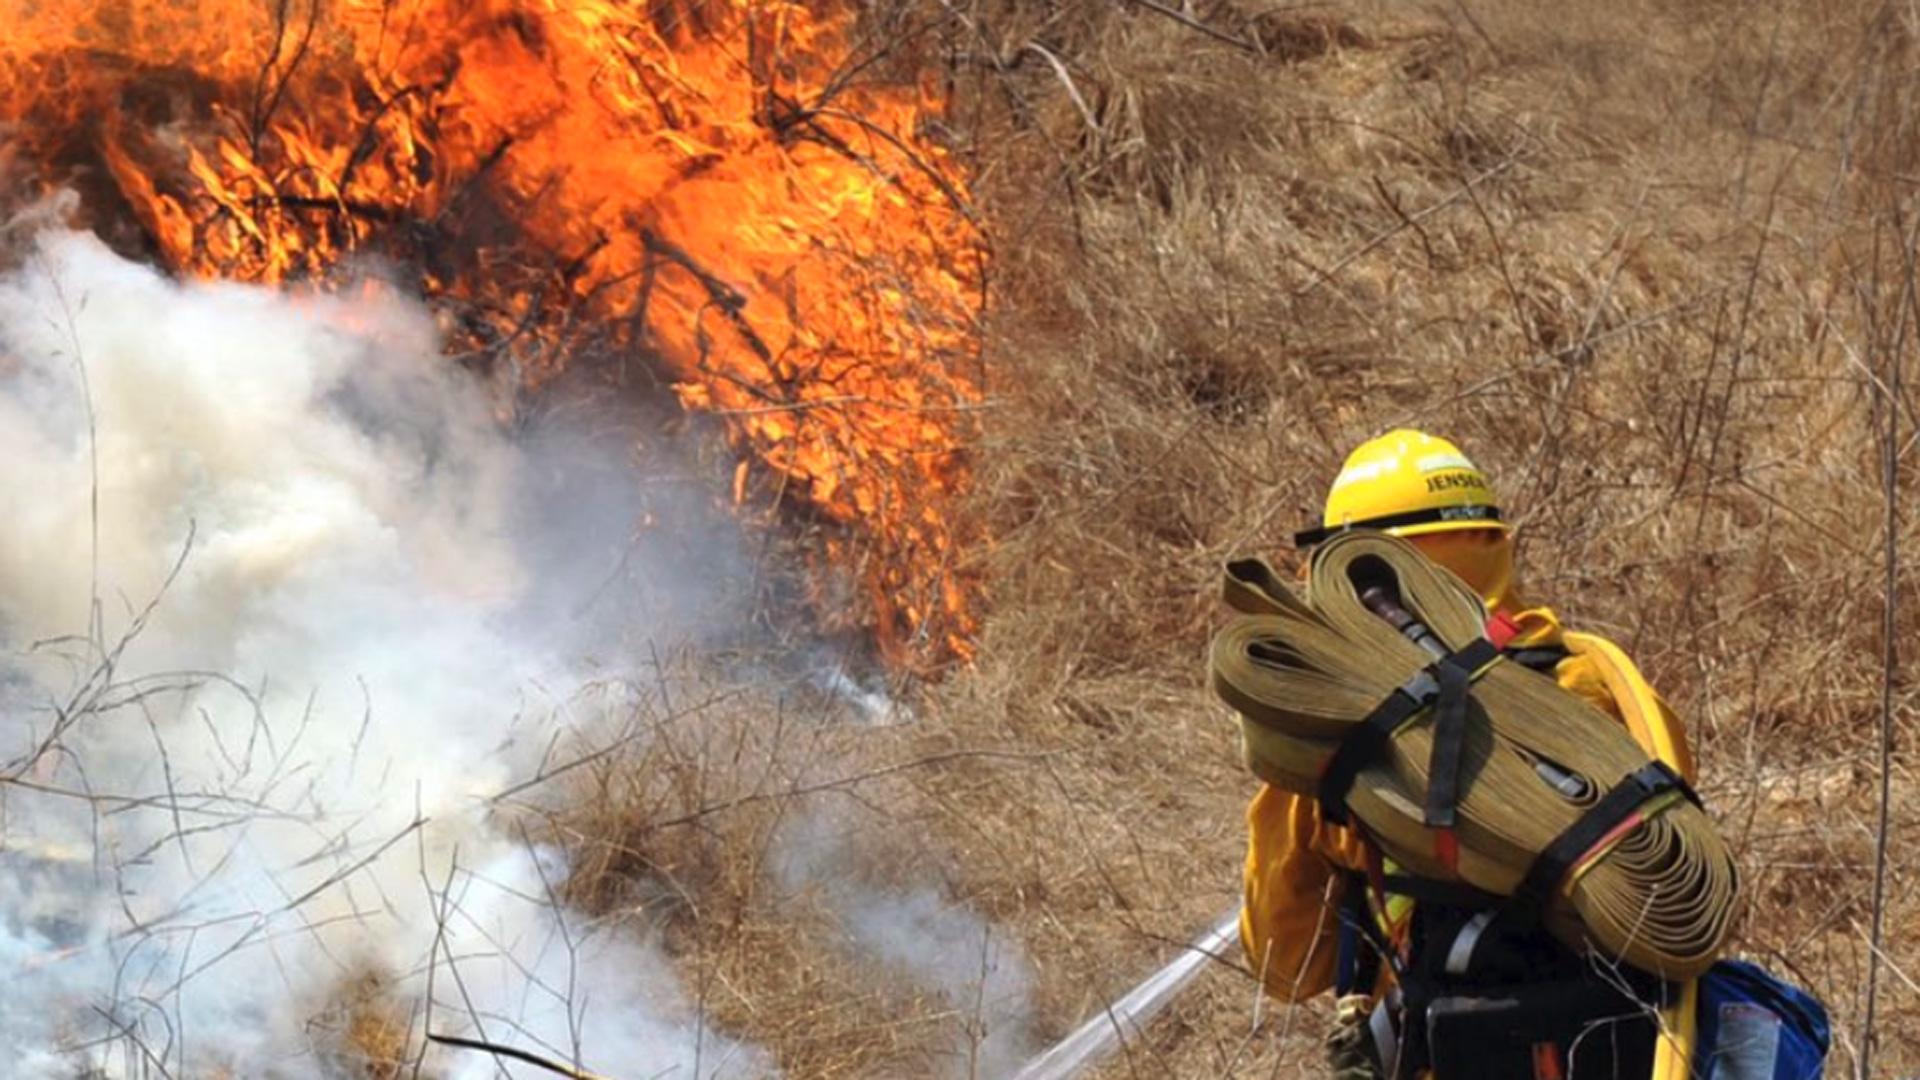 The Orange County Fire Authority battled a brush fire at Irvine Regional Park on July 5, 2020. (OCFA)